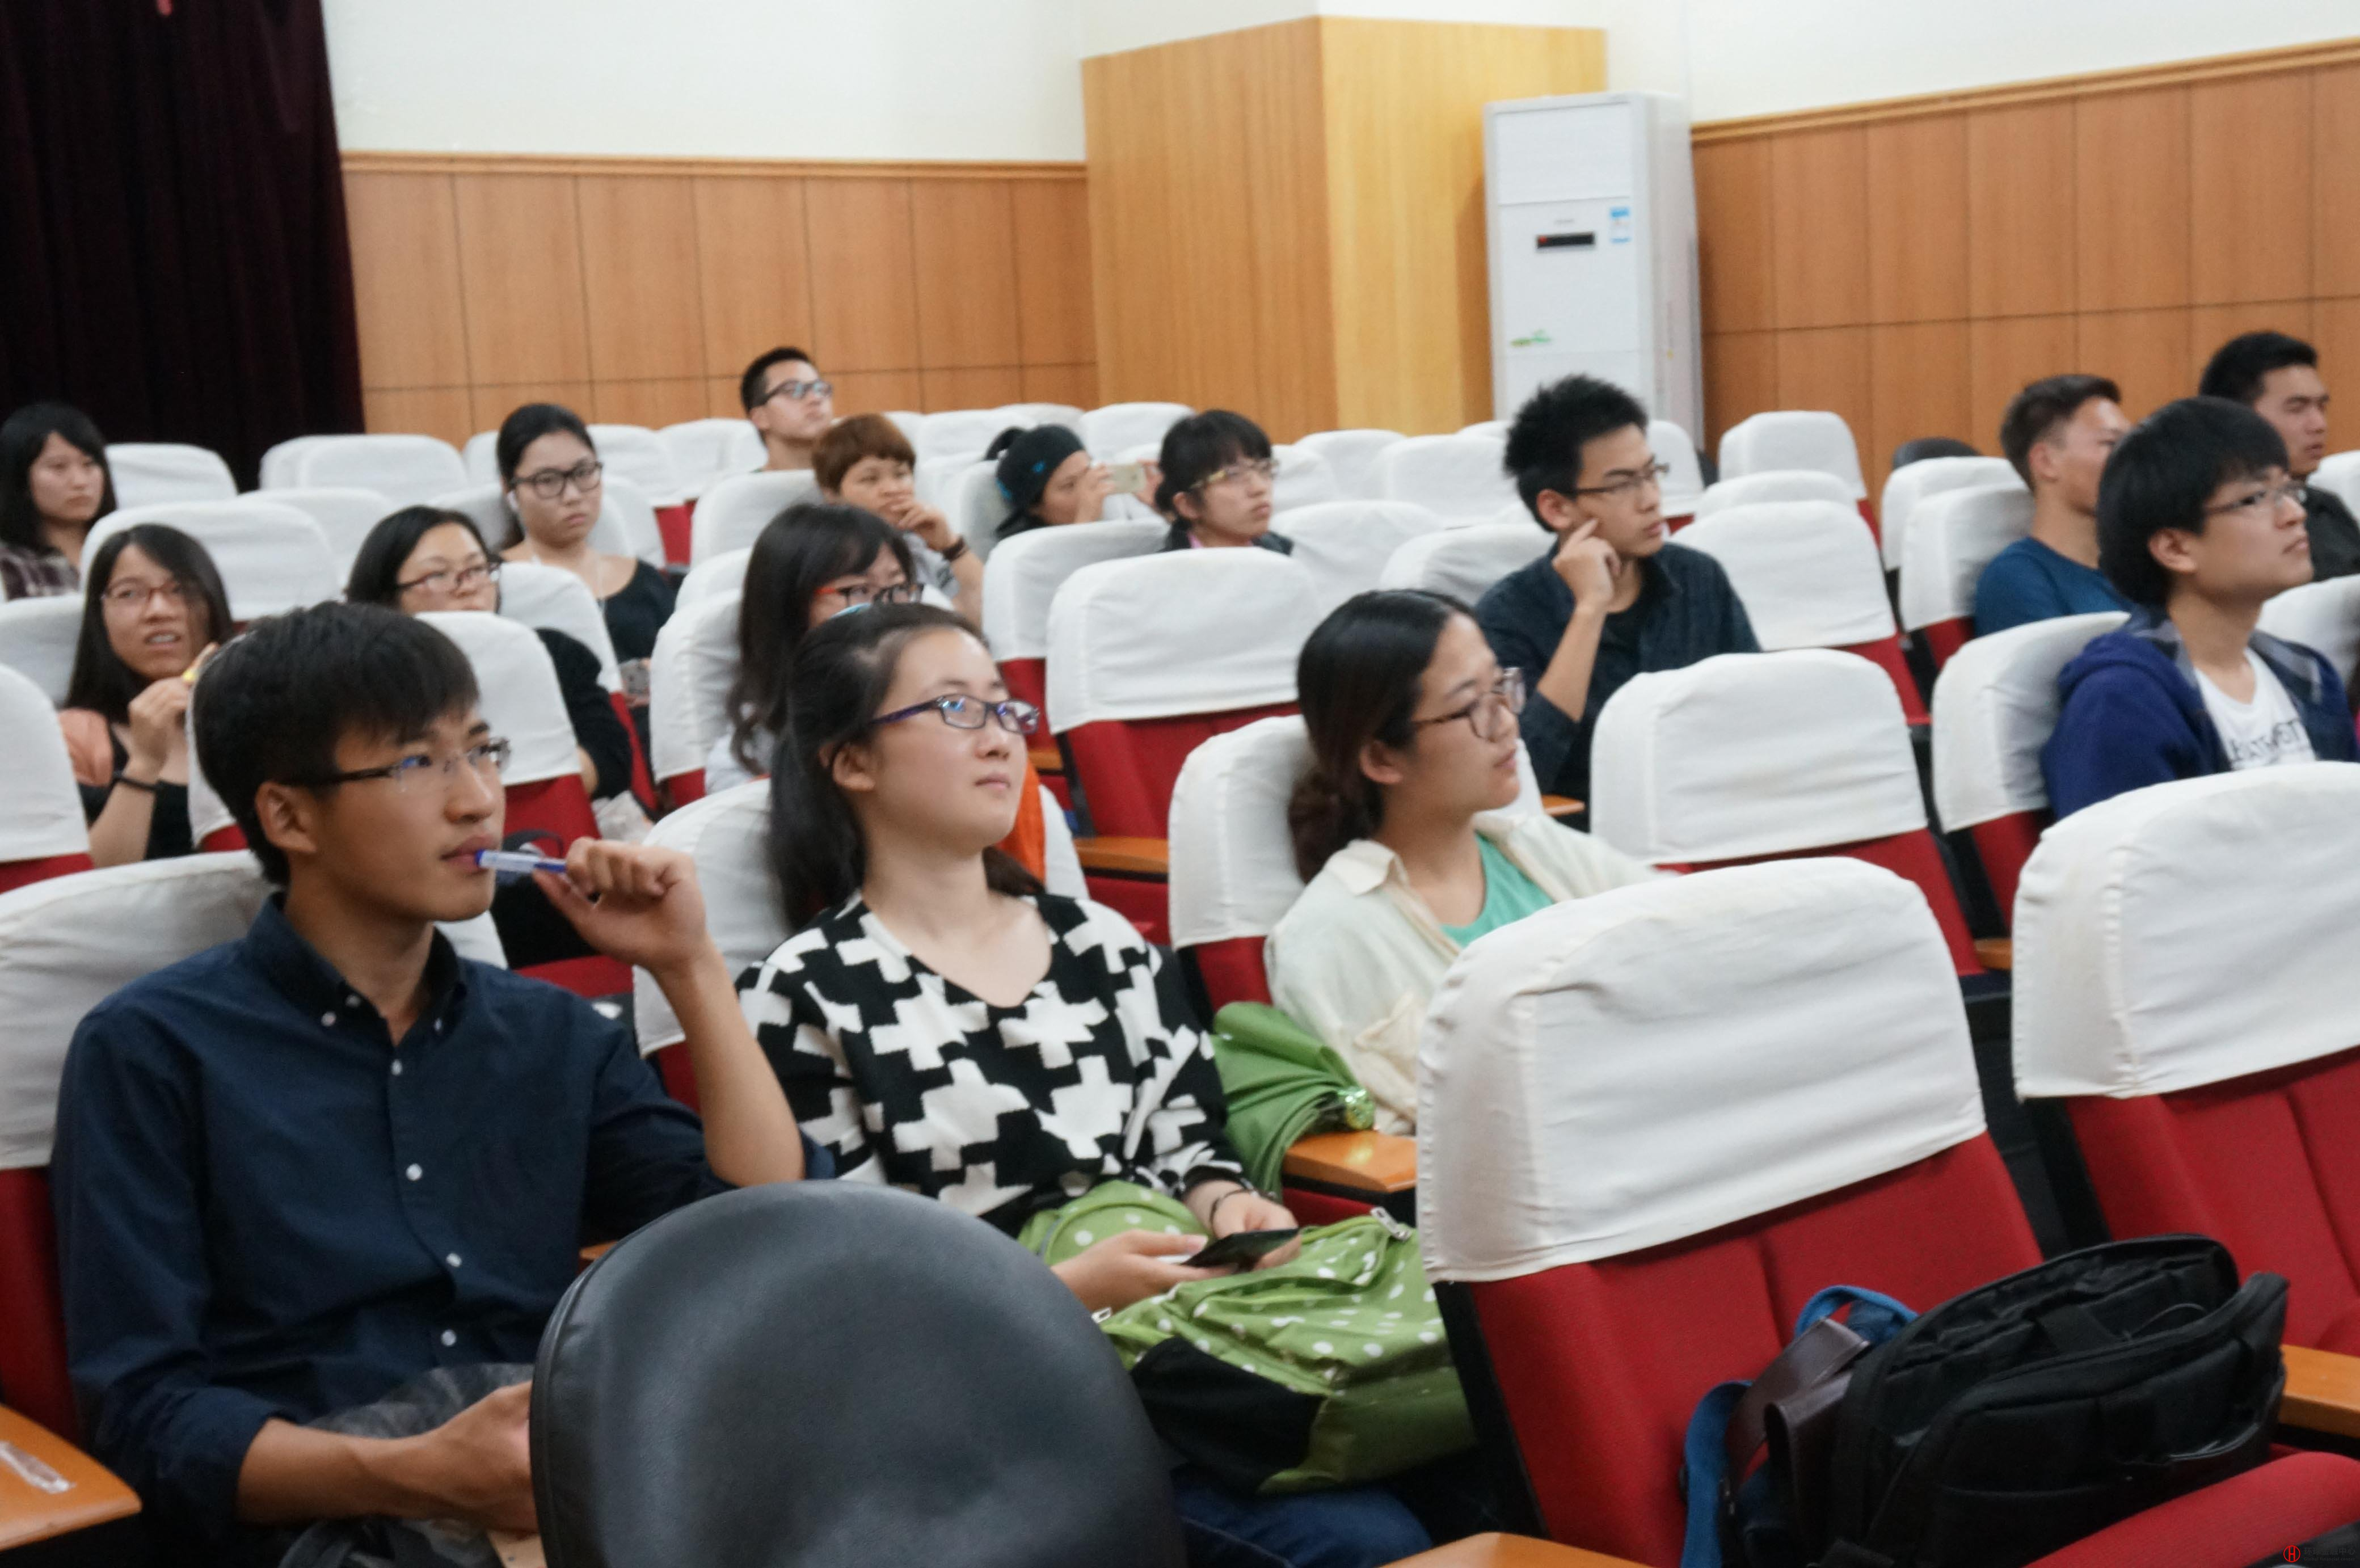 <b>上海外国语大学邀请张泽华讲授网络营销</b>